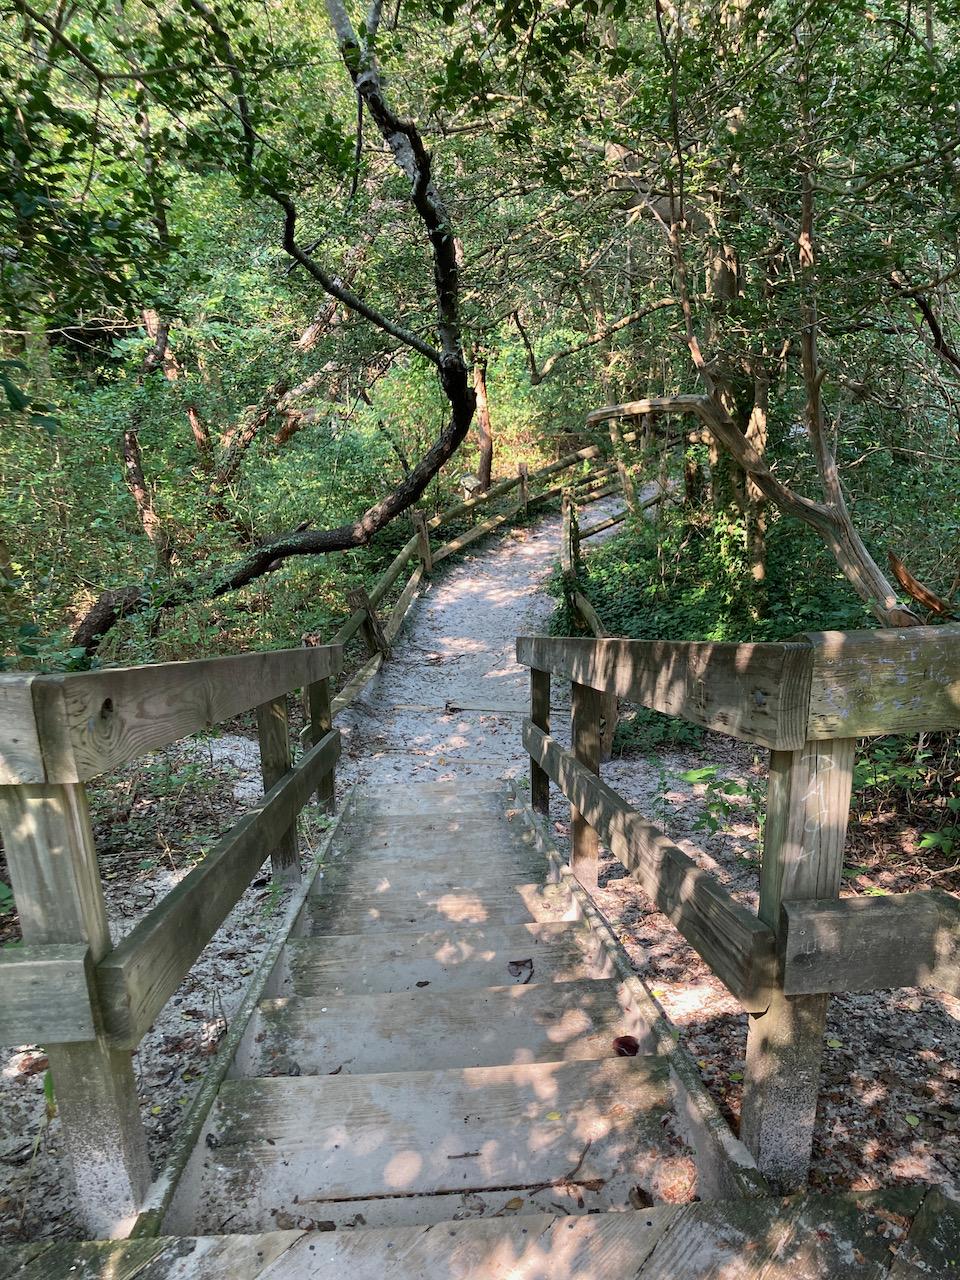 Pathway through woods on beach.